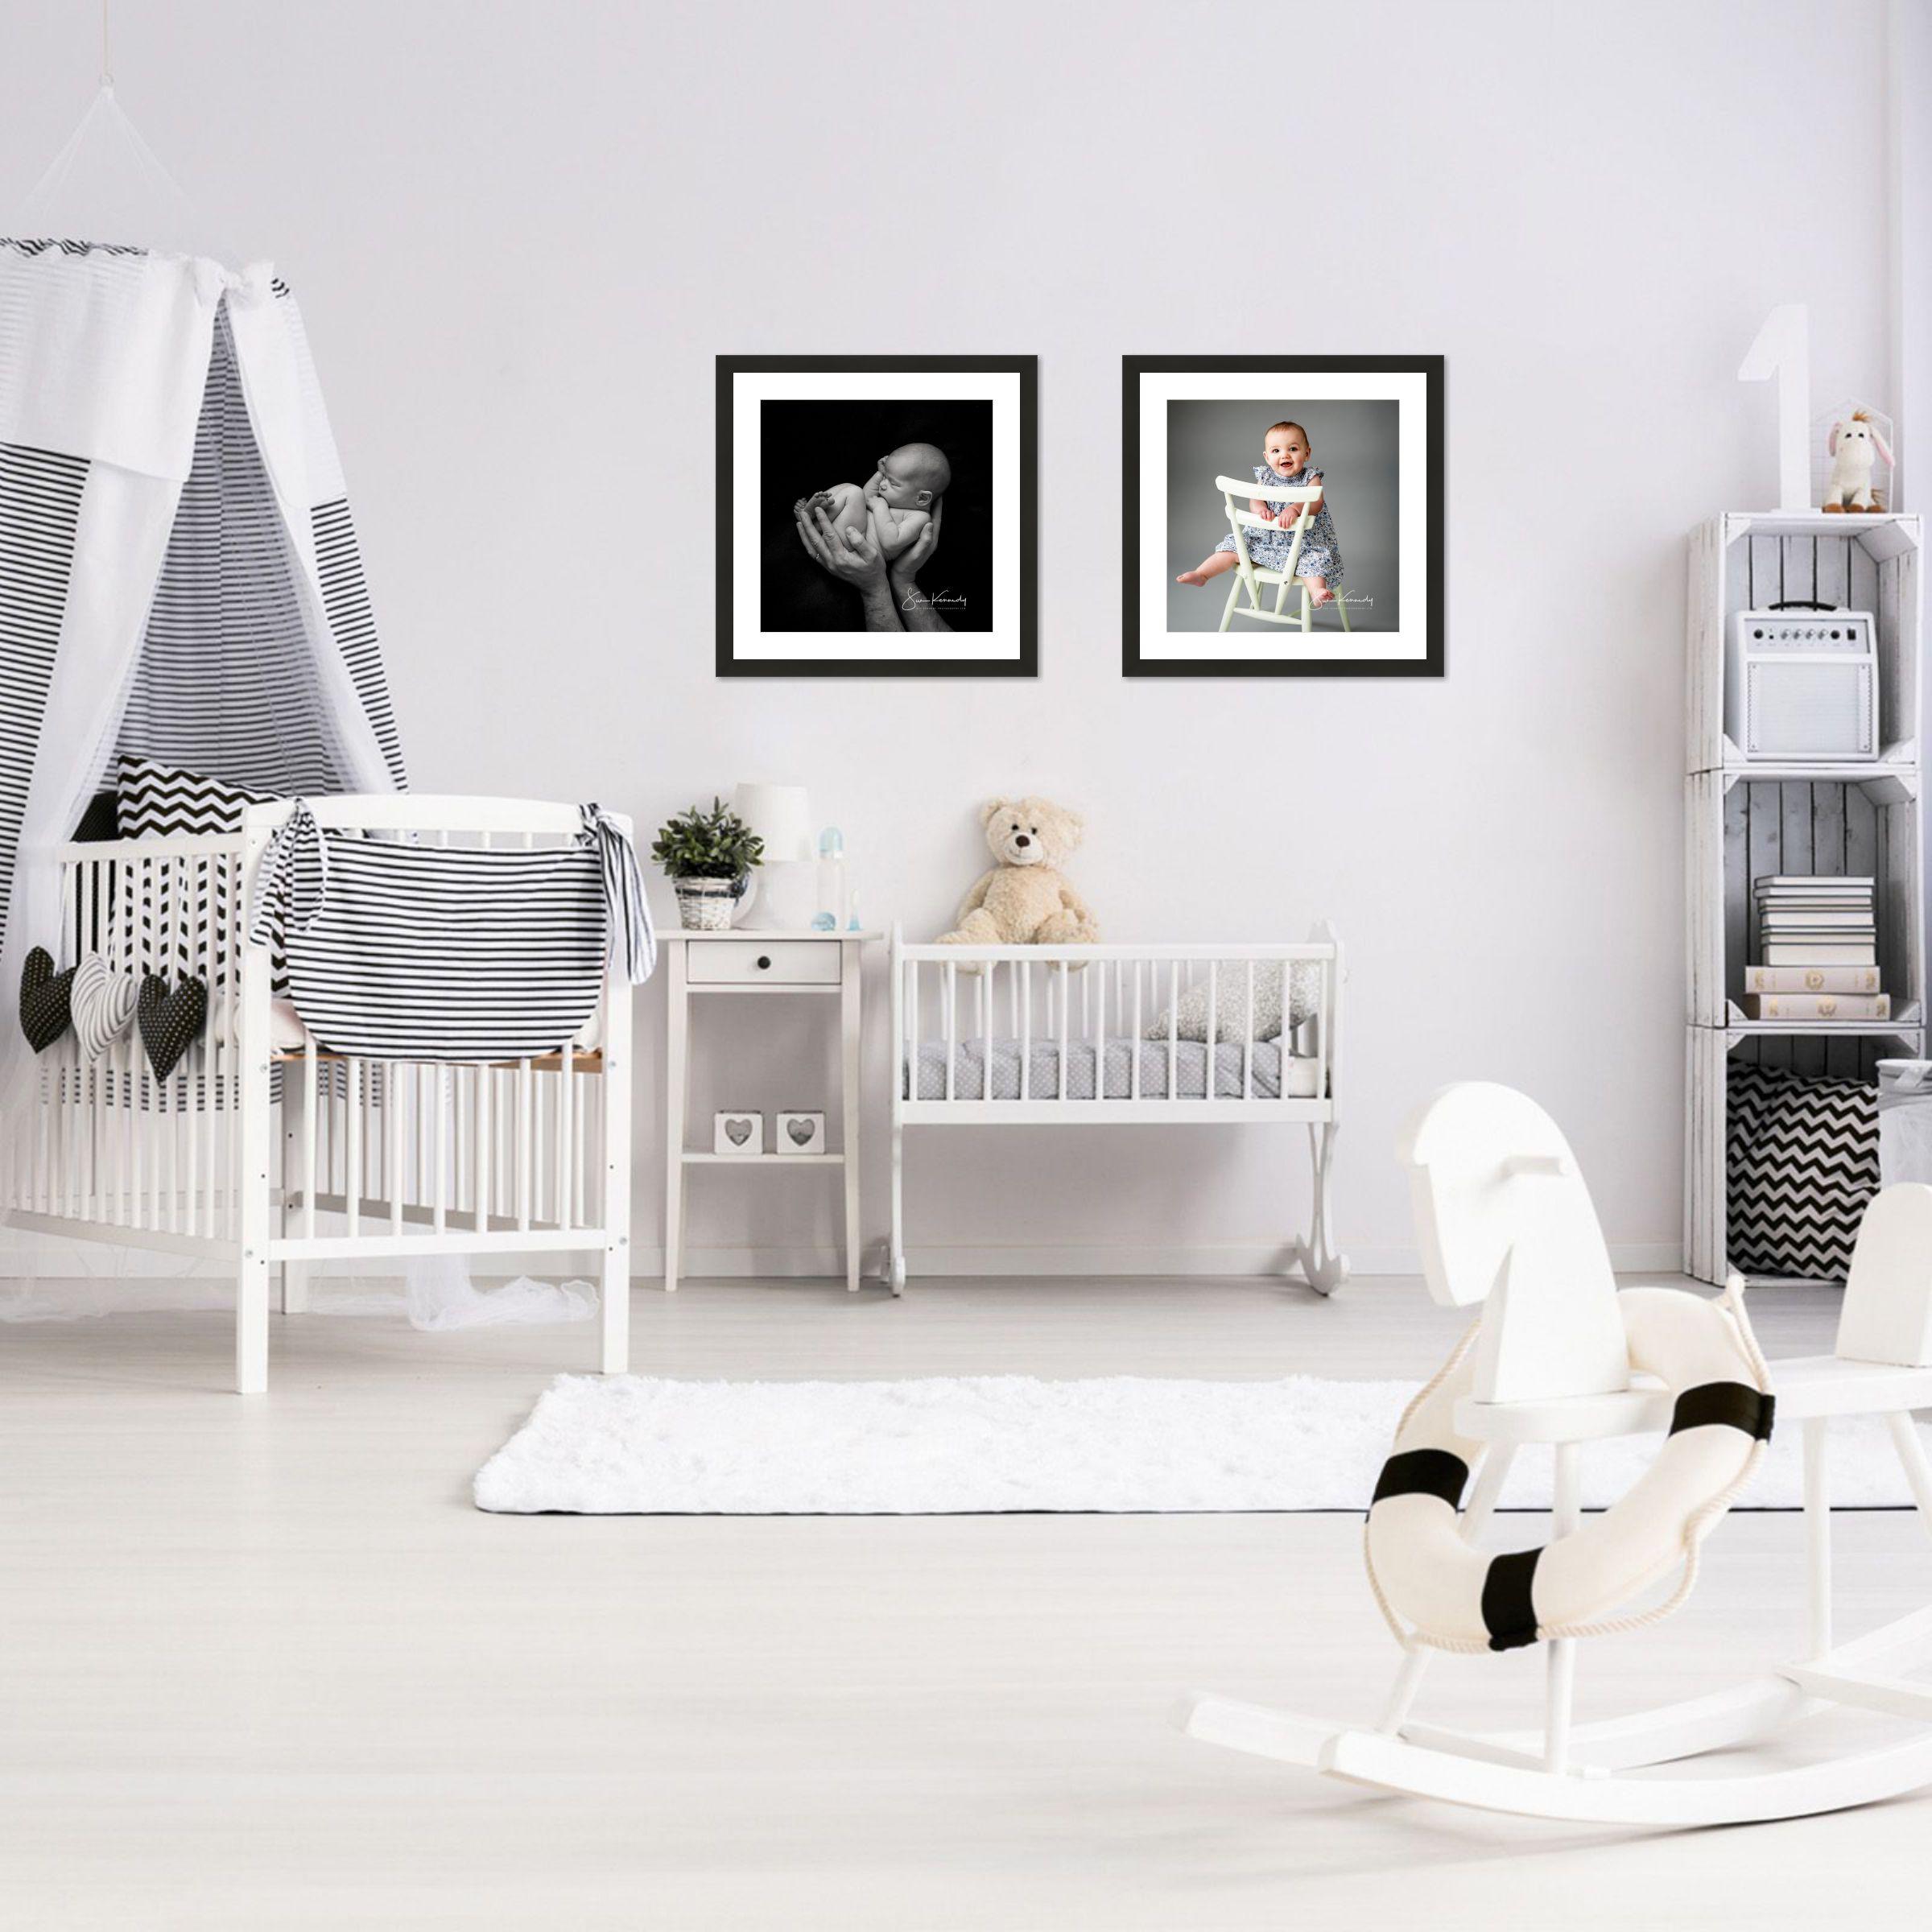 nursery room scene with photography wall art